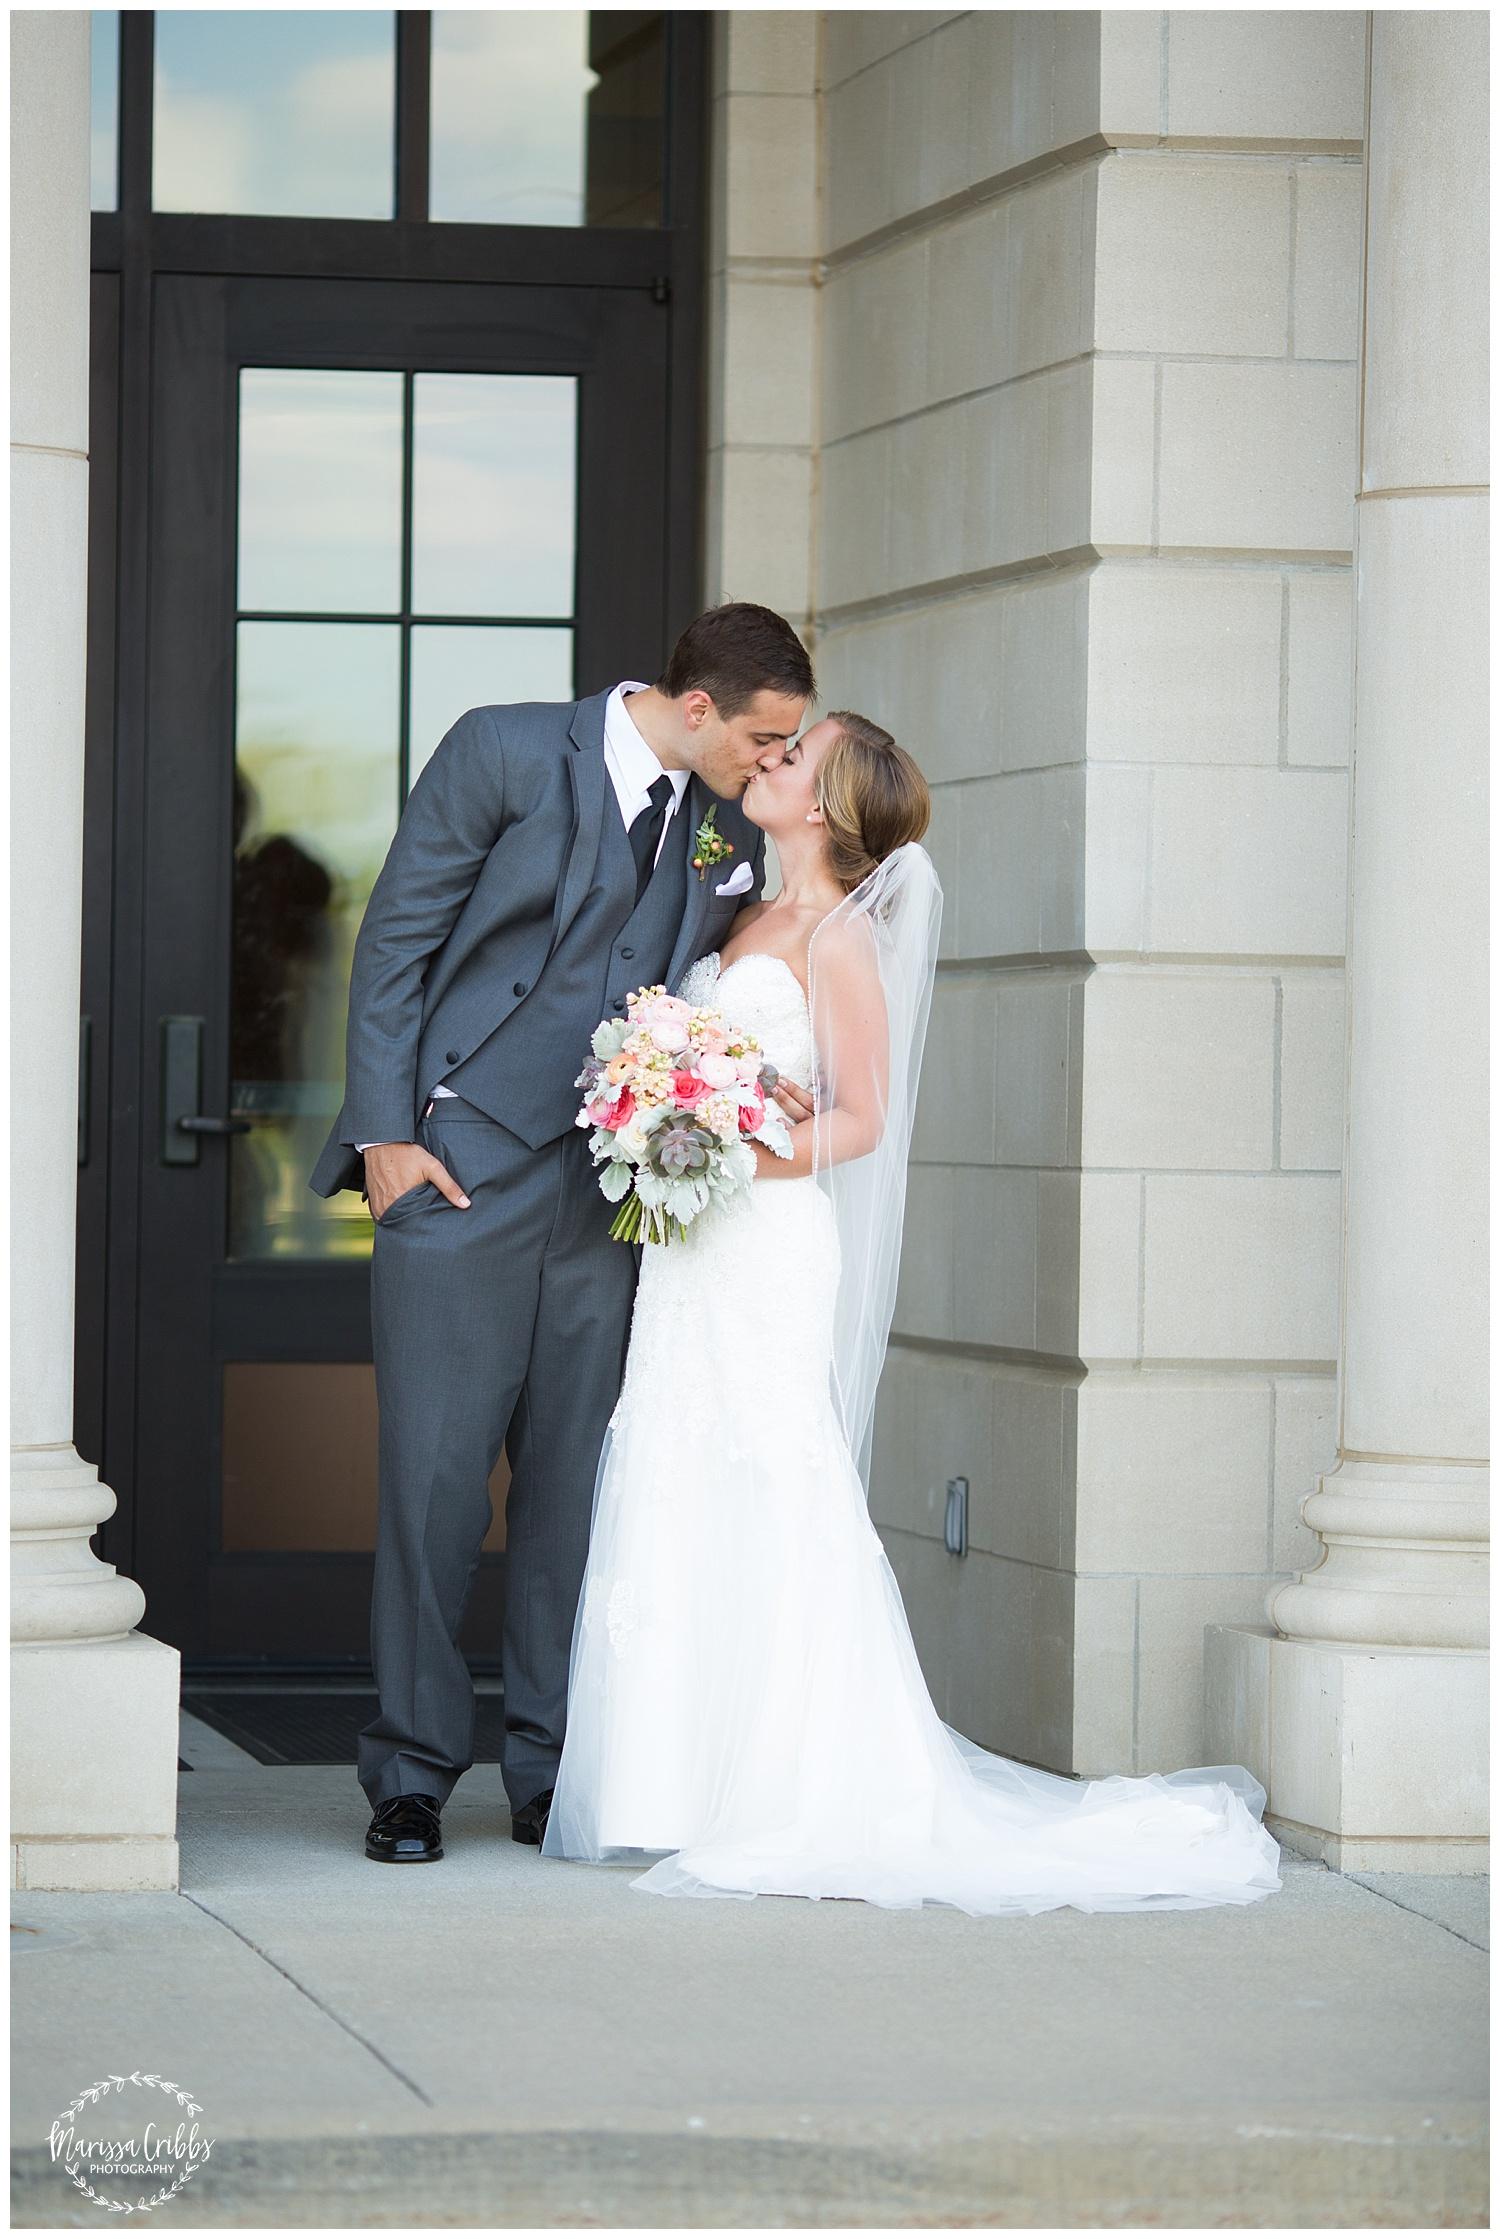 Twin Double Wedding | Union Horse Distilling Co. | Marissa Cribbs Photography | KC Weddings_0108.jpg